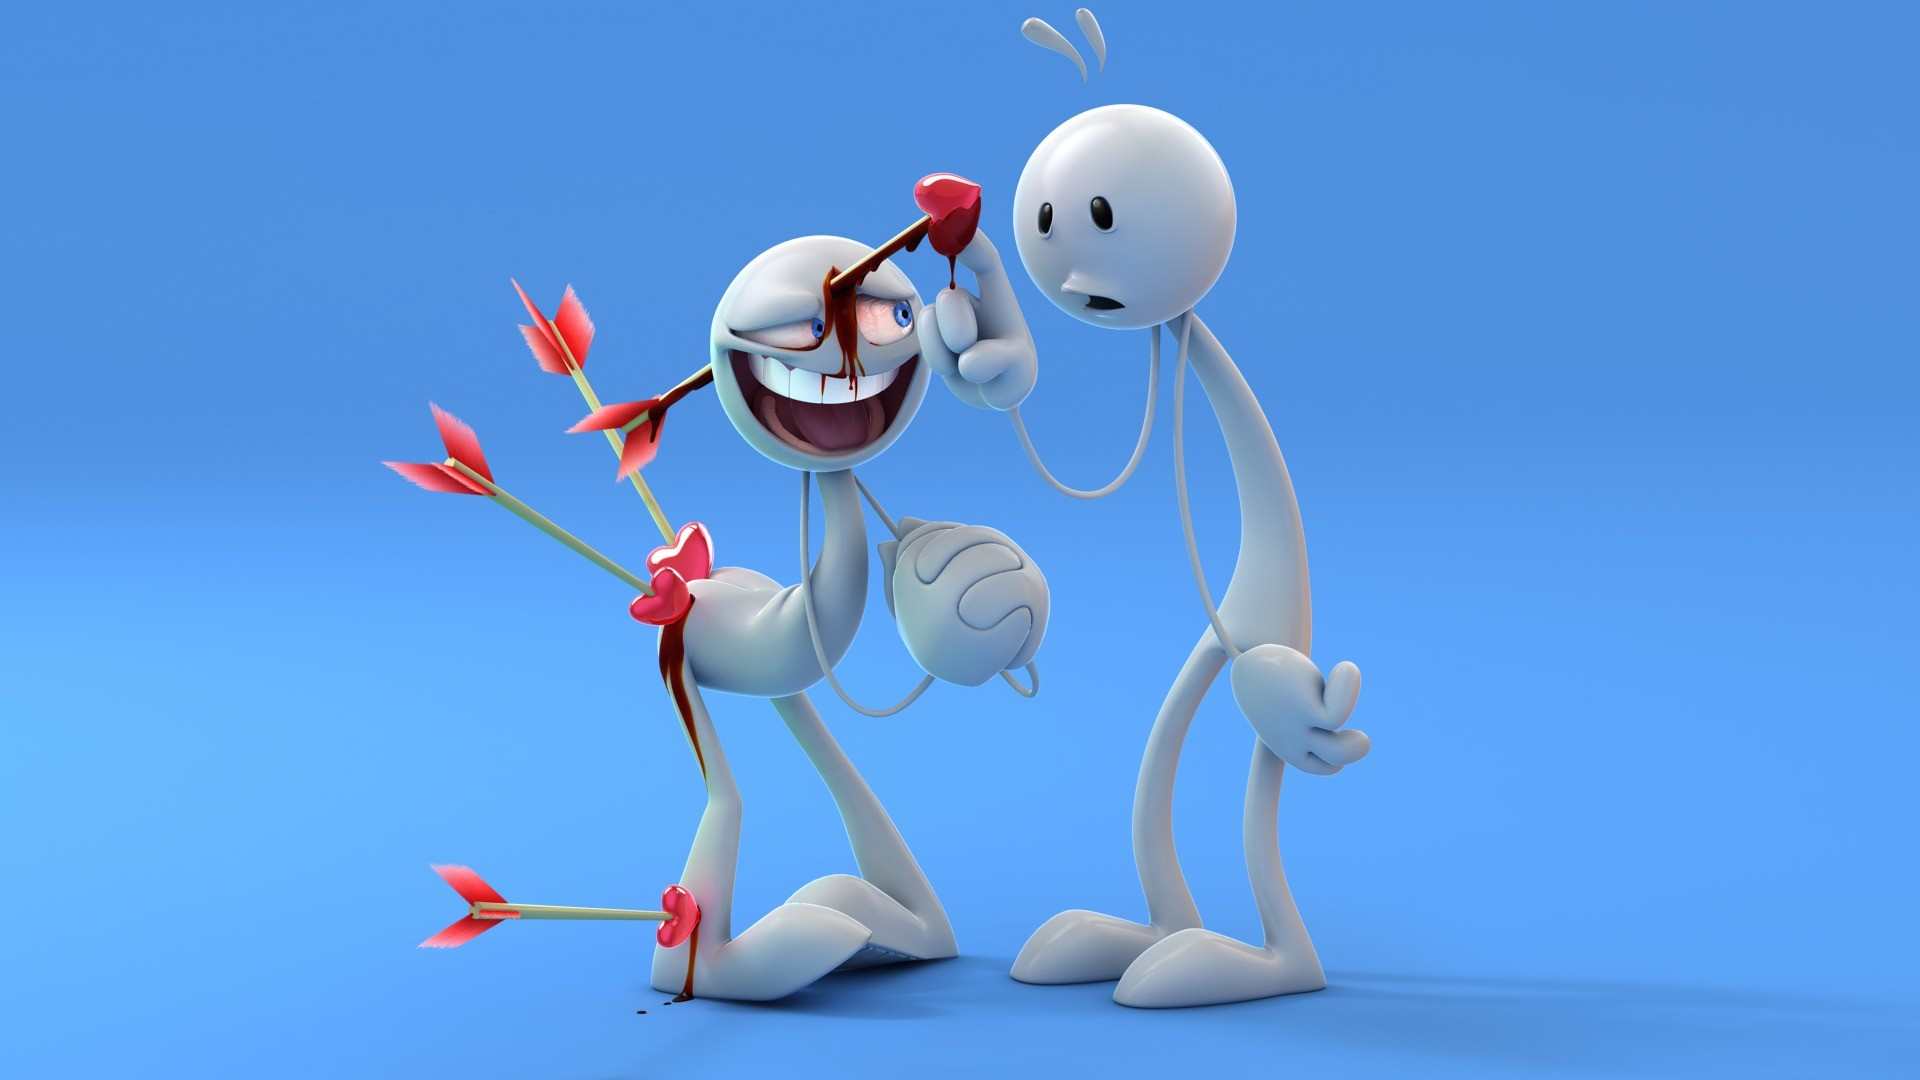 Funny Love Cartoon Images HD Wallpaper